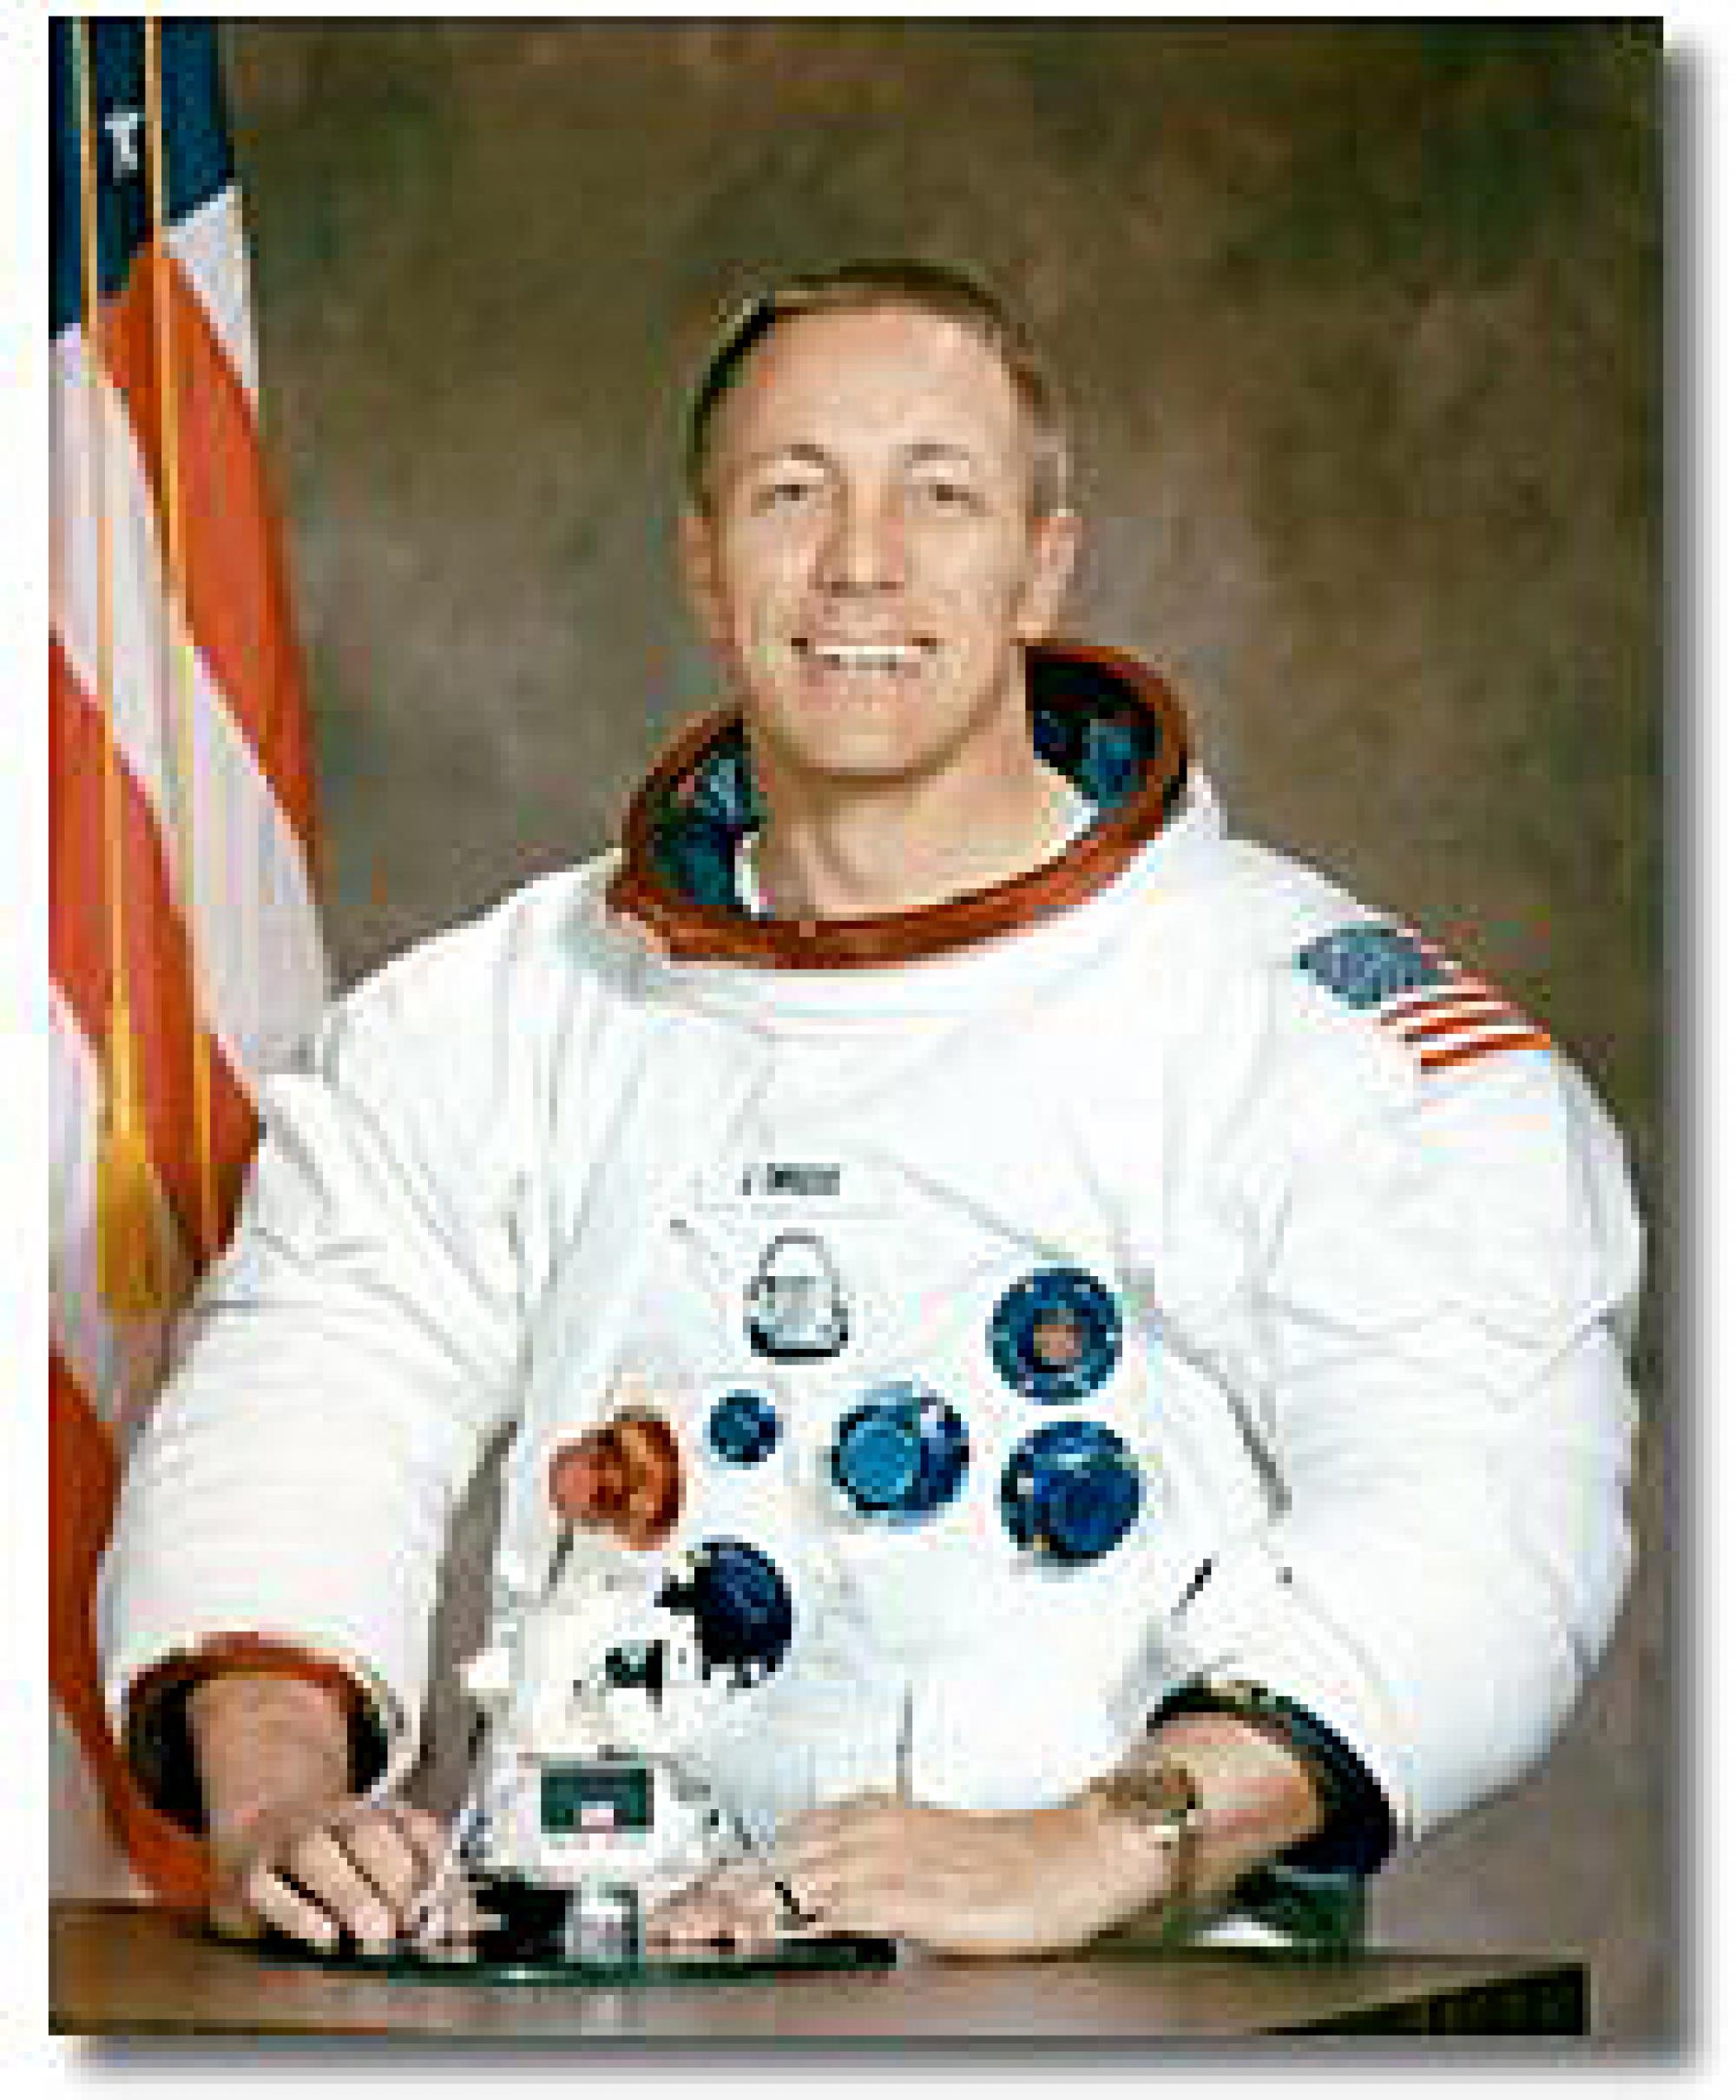 John L. 'Jack' Swigert Jr., command module pilot on Apollo 13.